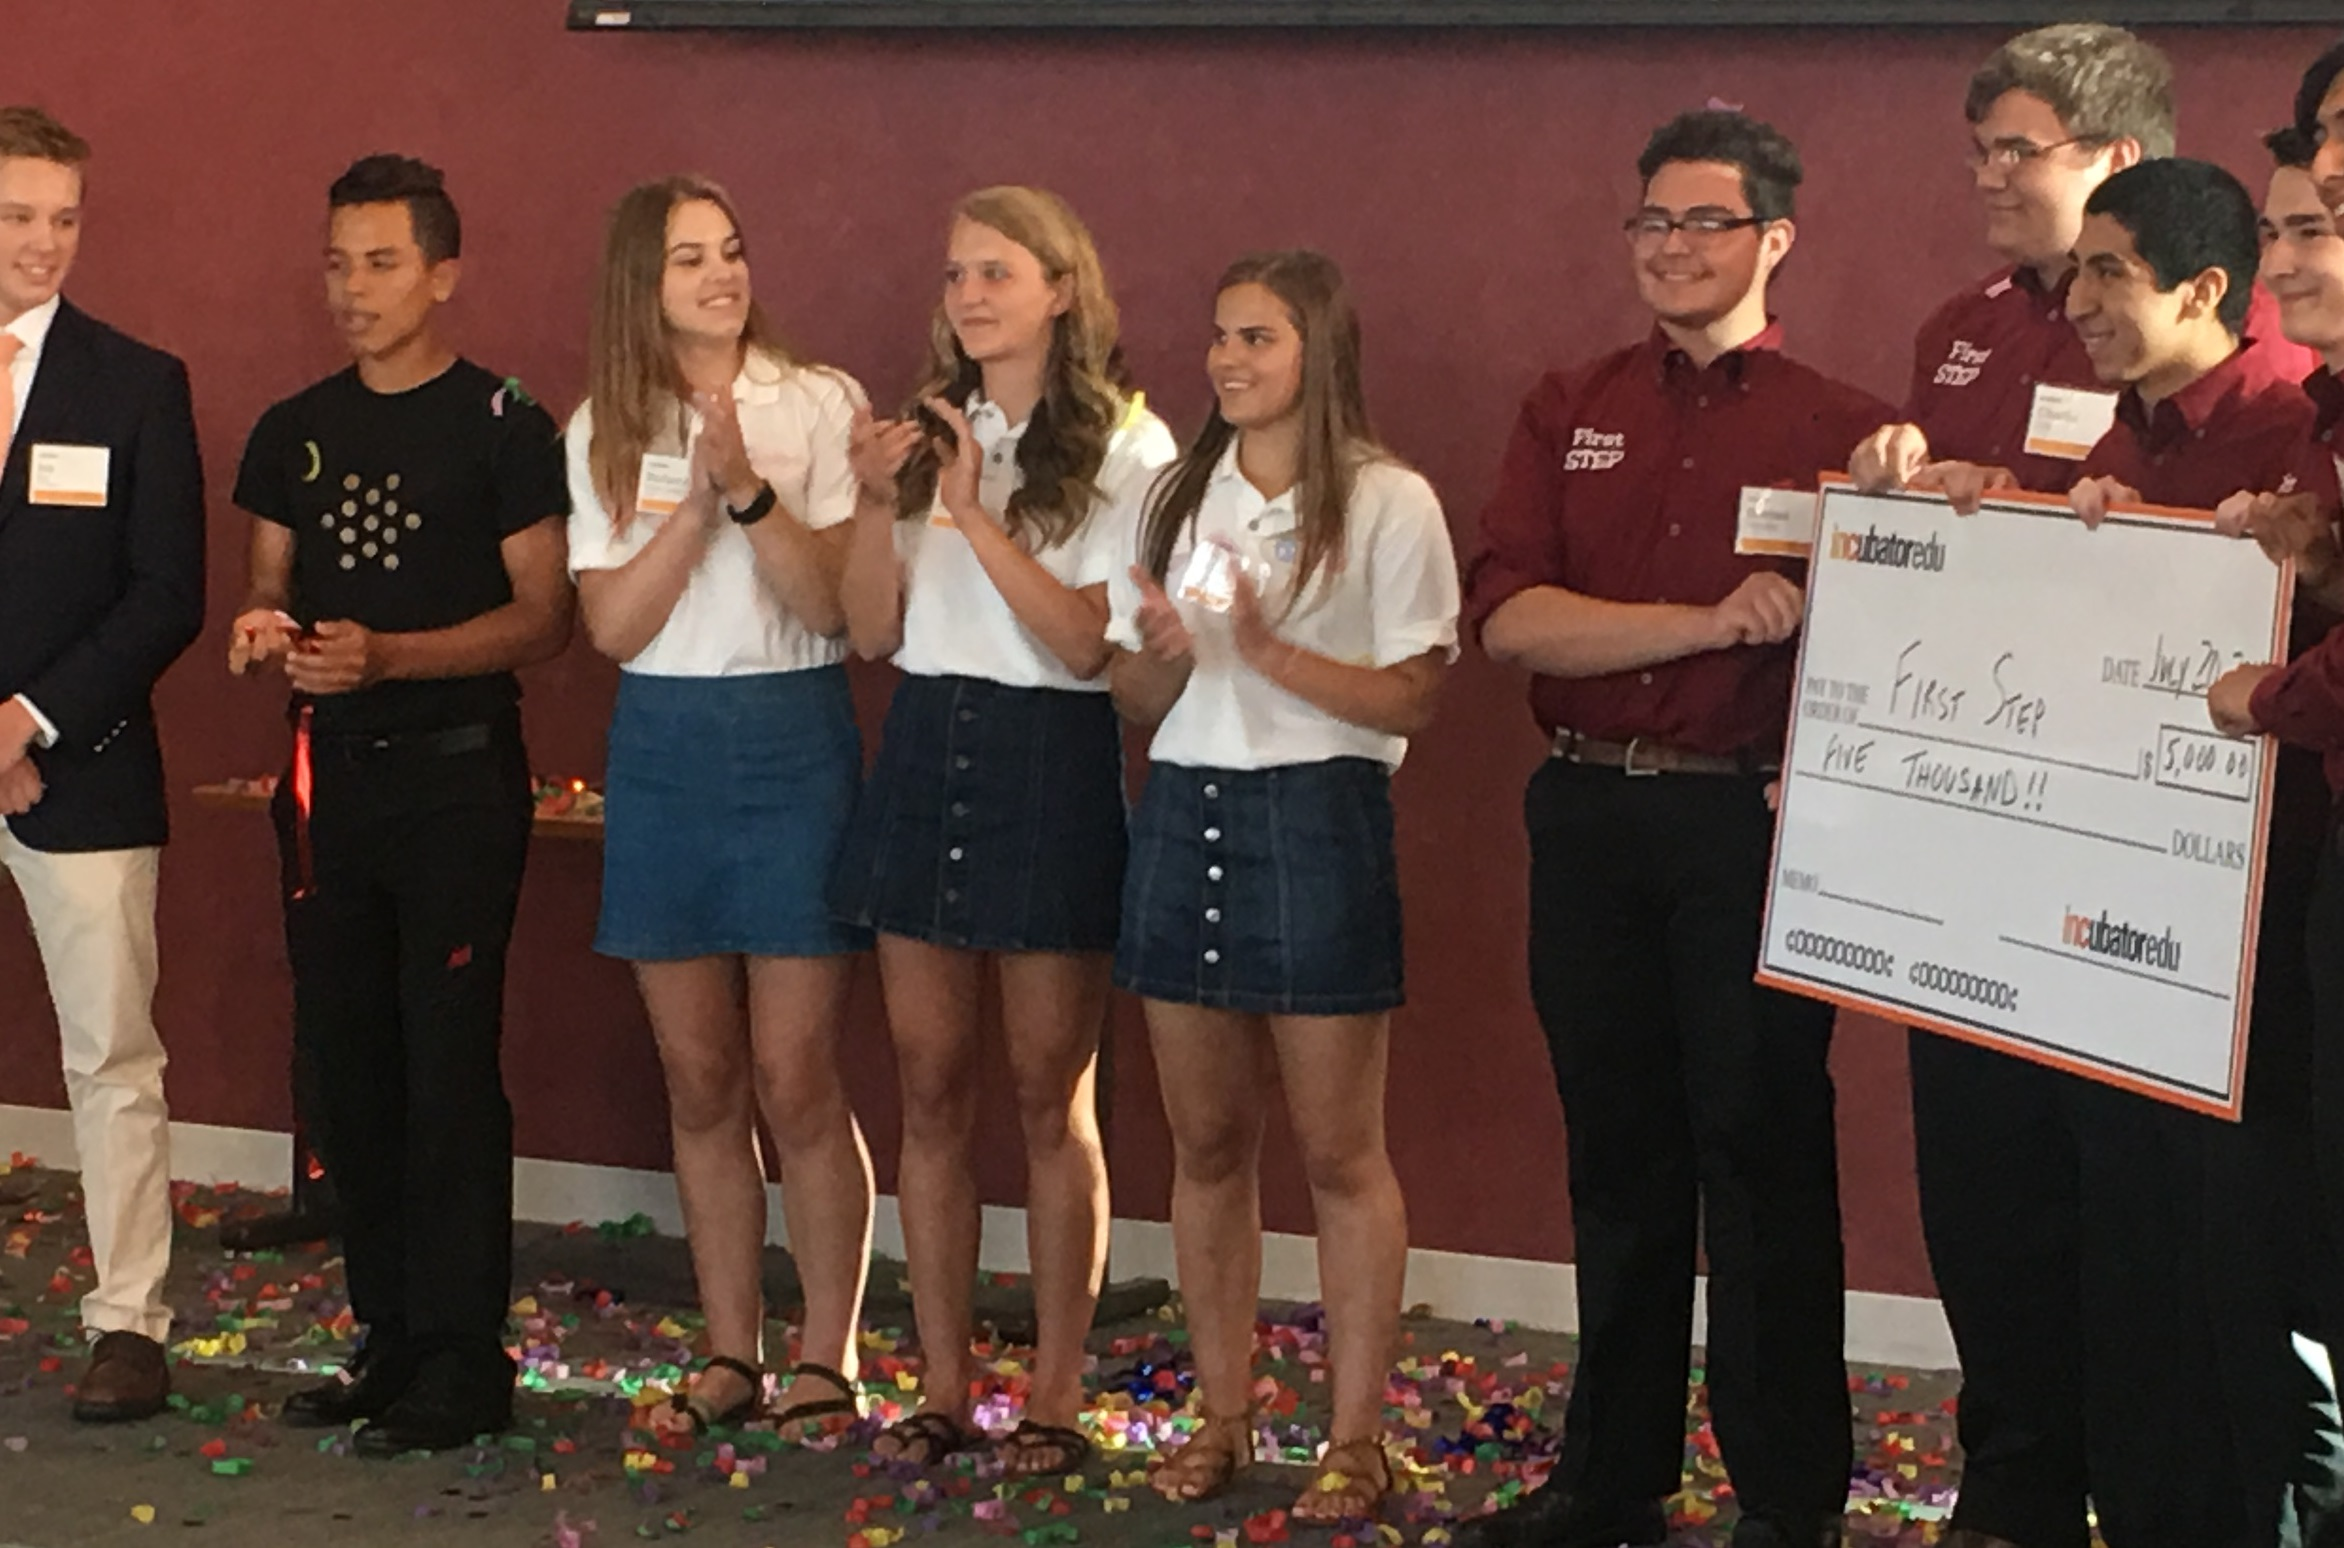 The 2017 INCubatoredu National Summit on High School Entrepreneurship – Featuring Student Entrepreneurship Competition and Showcasing Next-Generation Innovators